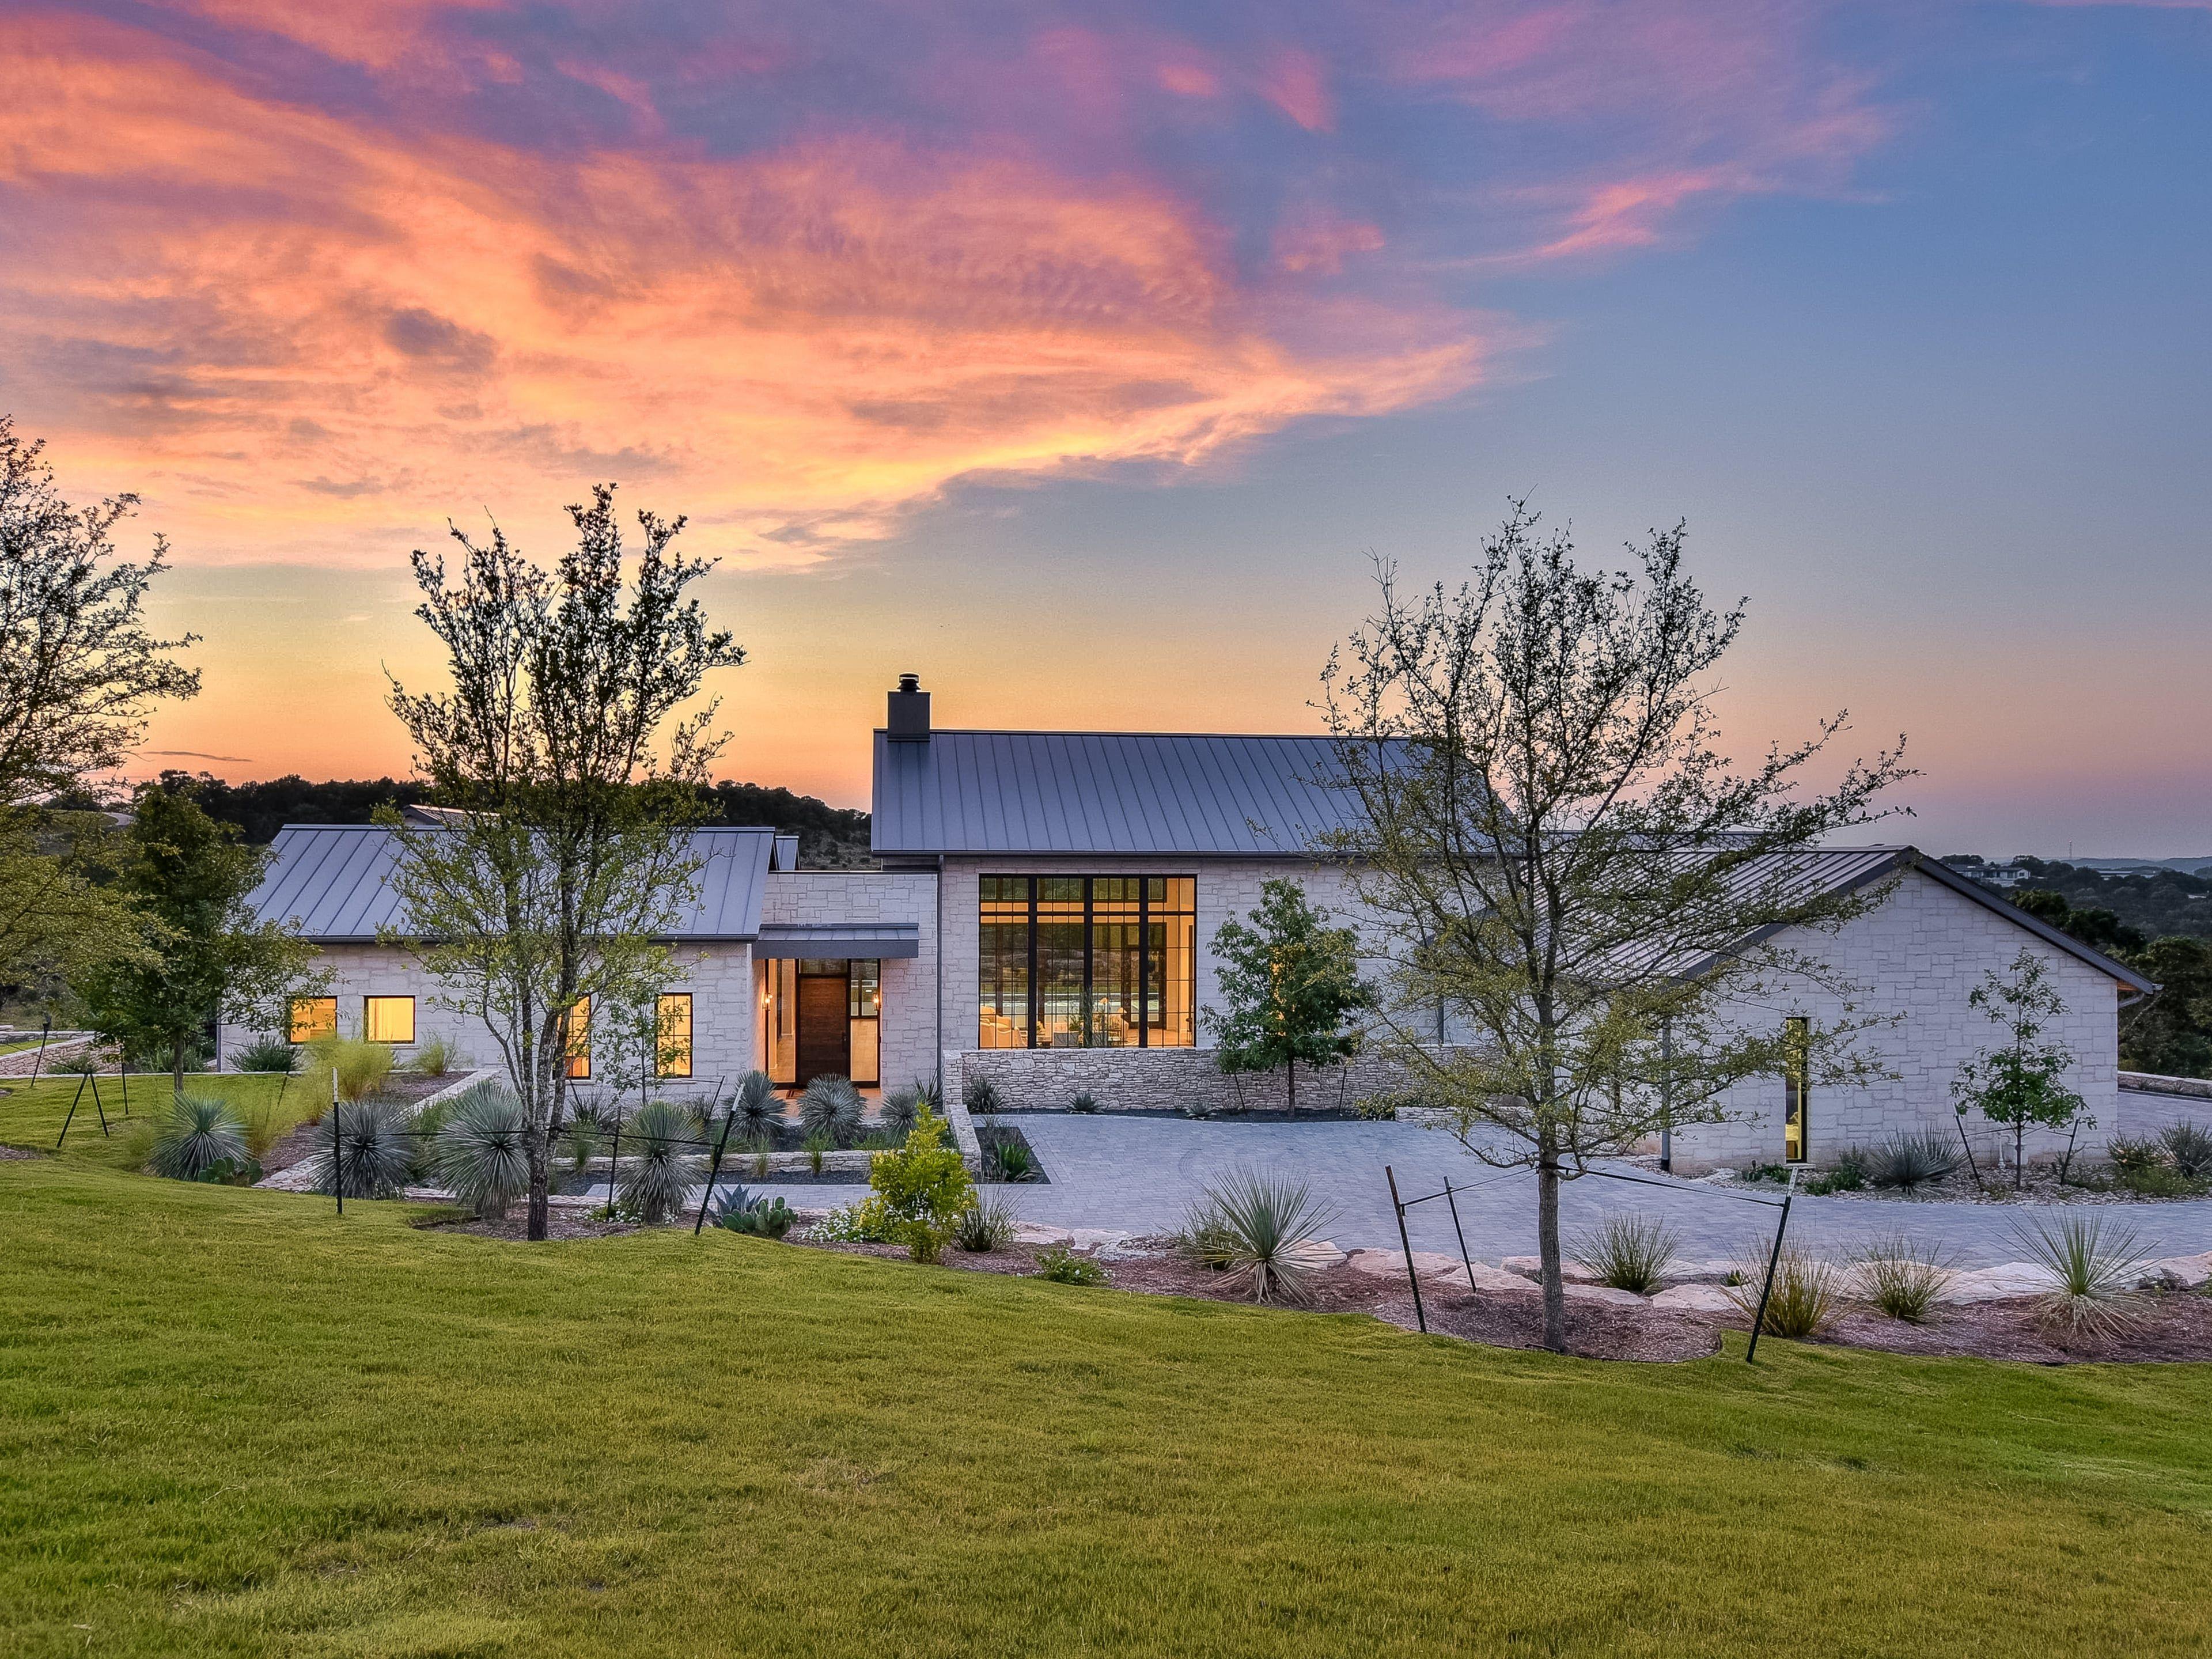 8400 valerio lane in 2020 ranch style homes unique